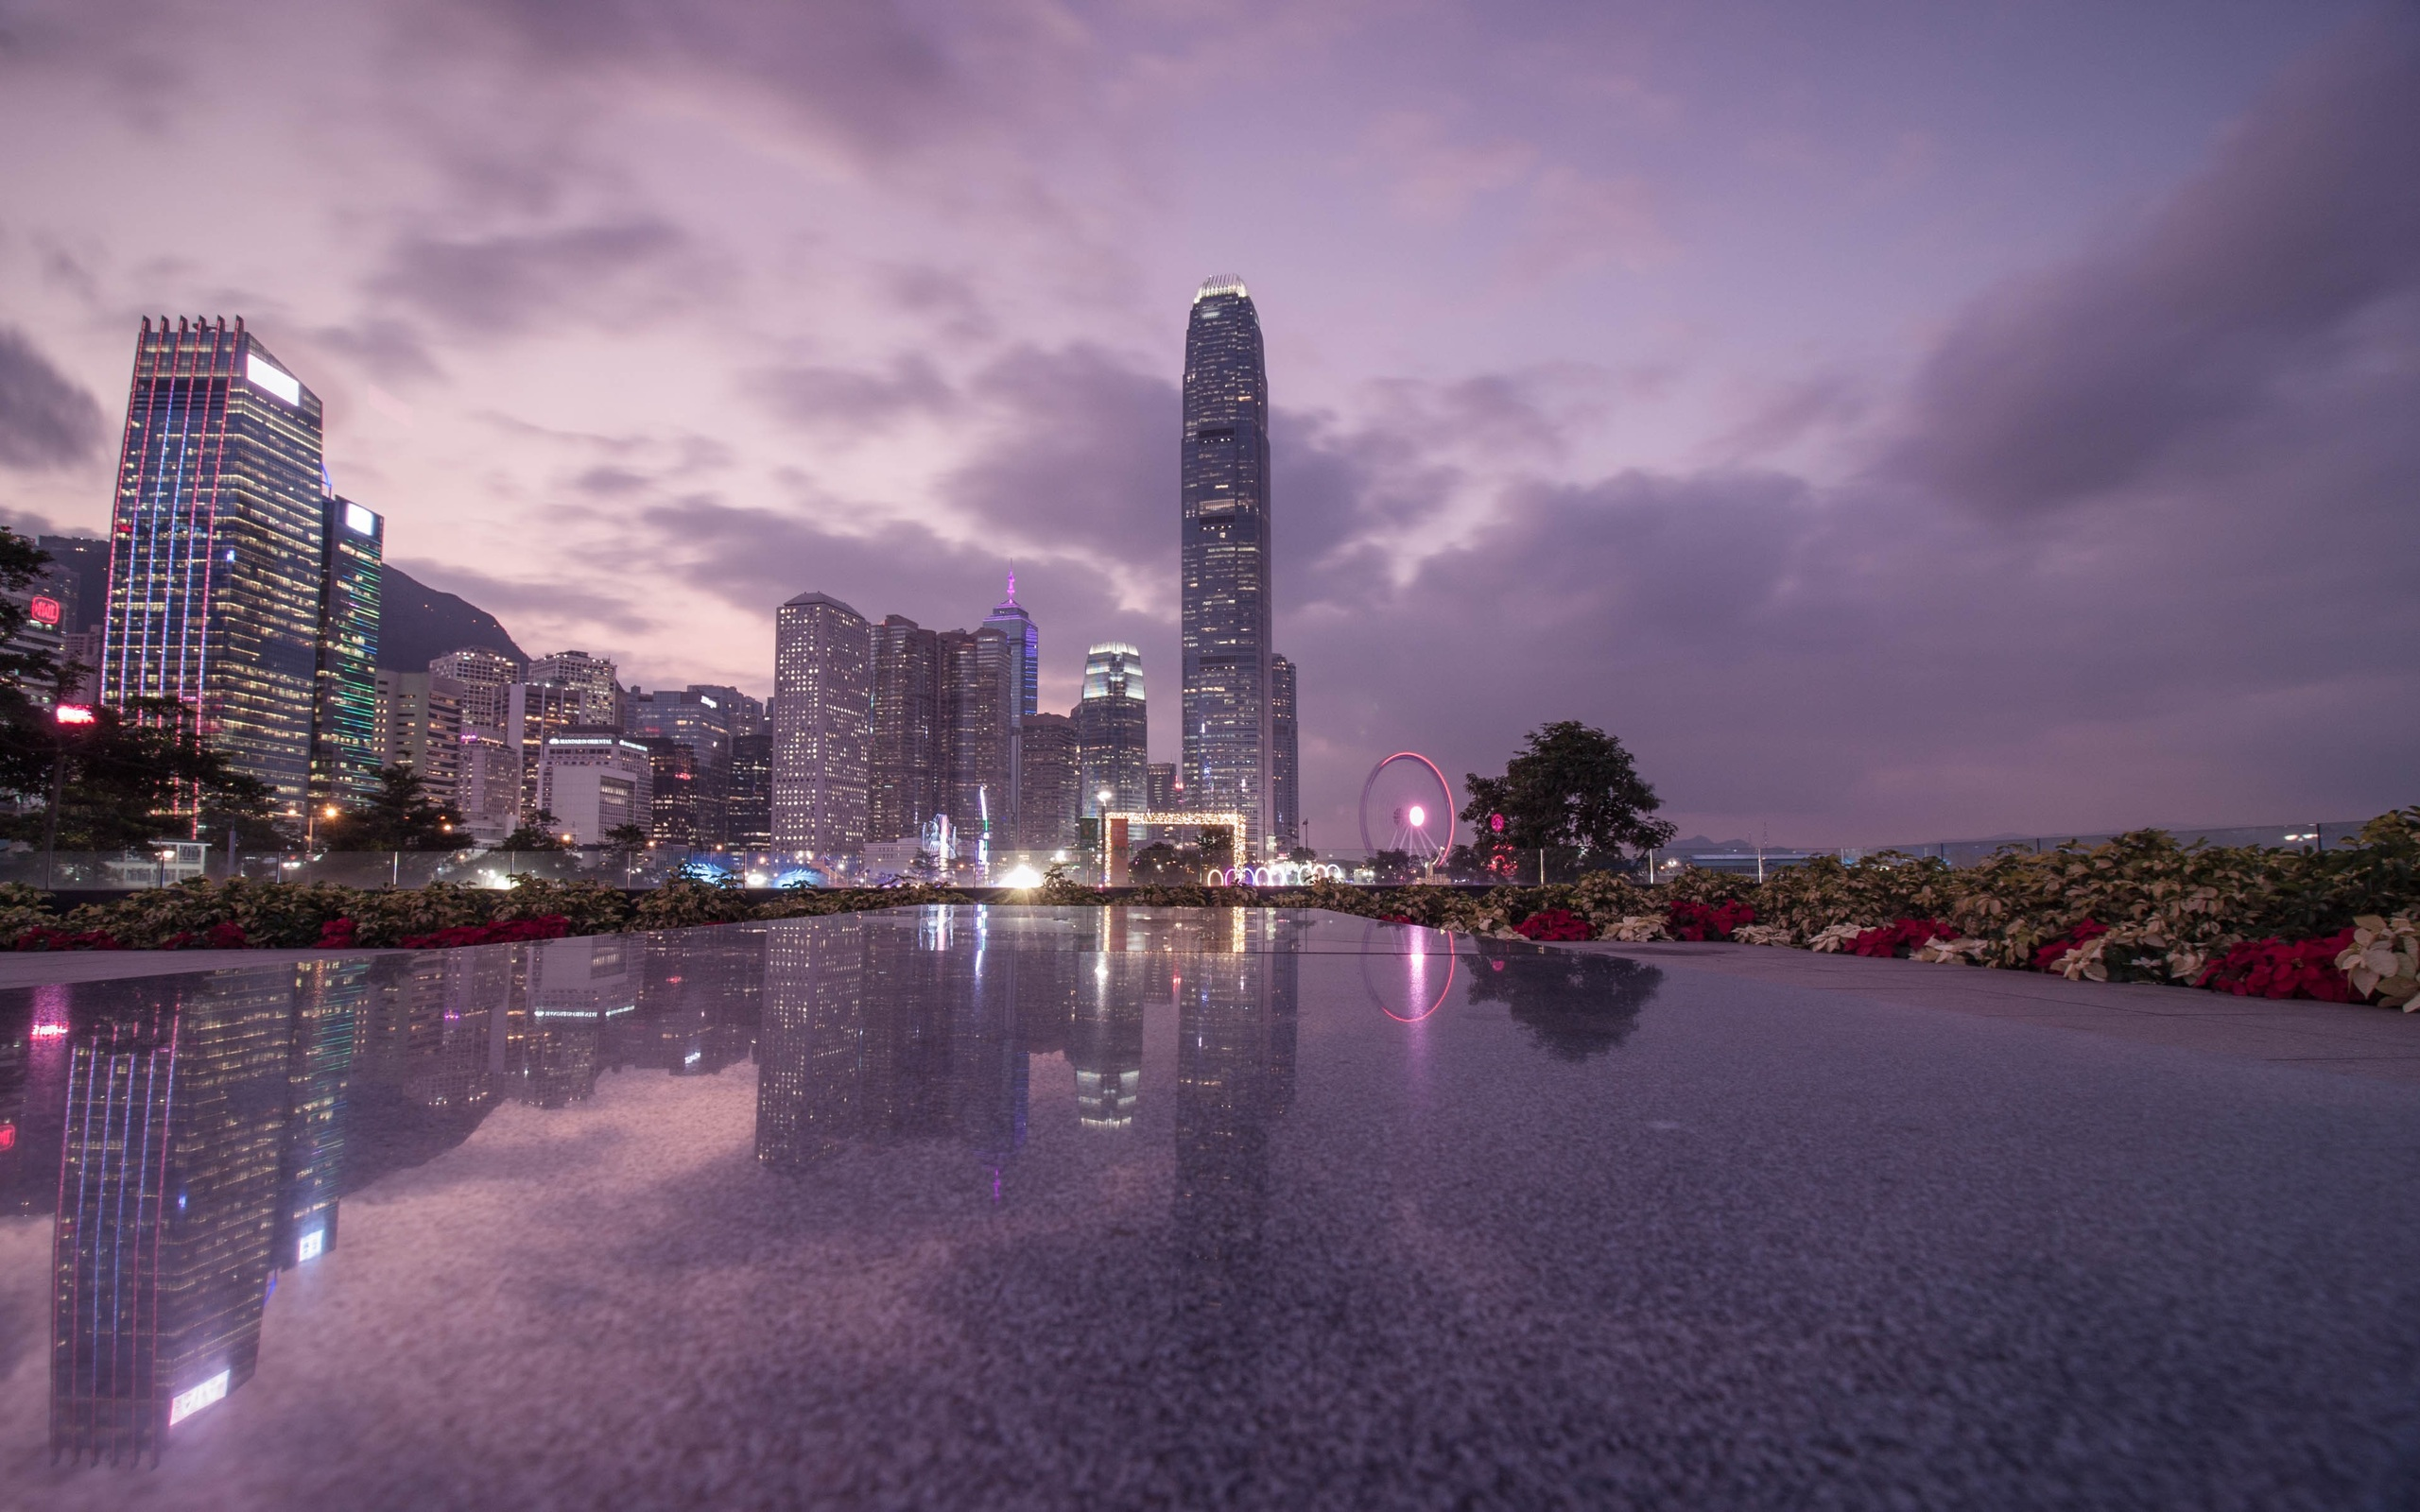 city-hong-kong-cityscape-urban-metropolis-building-4k-cd.jpg